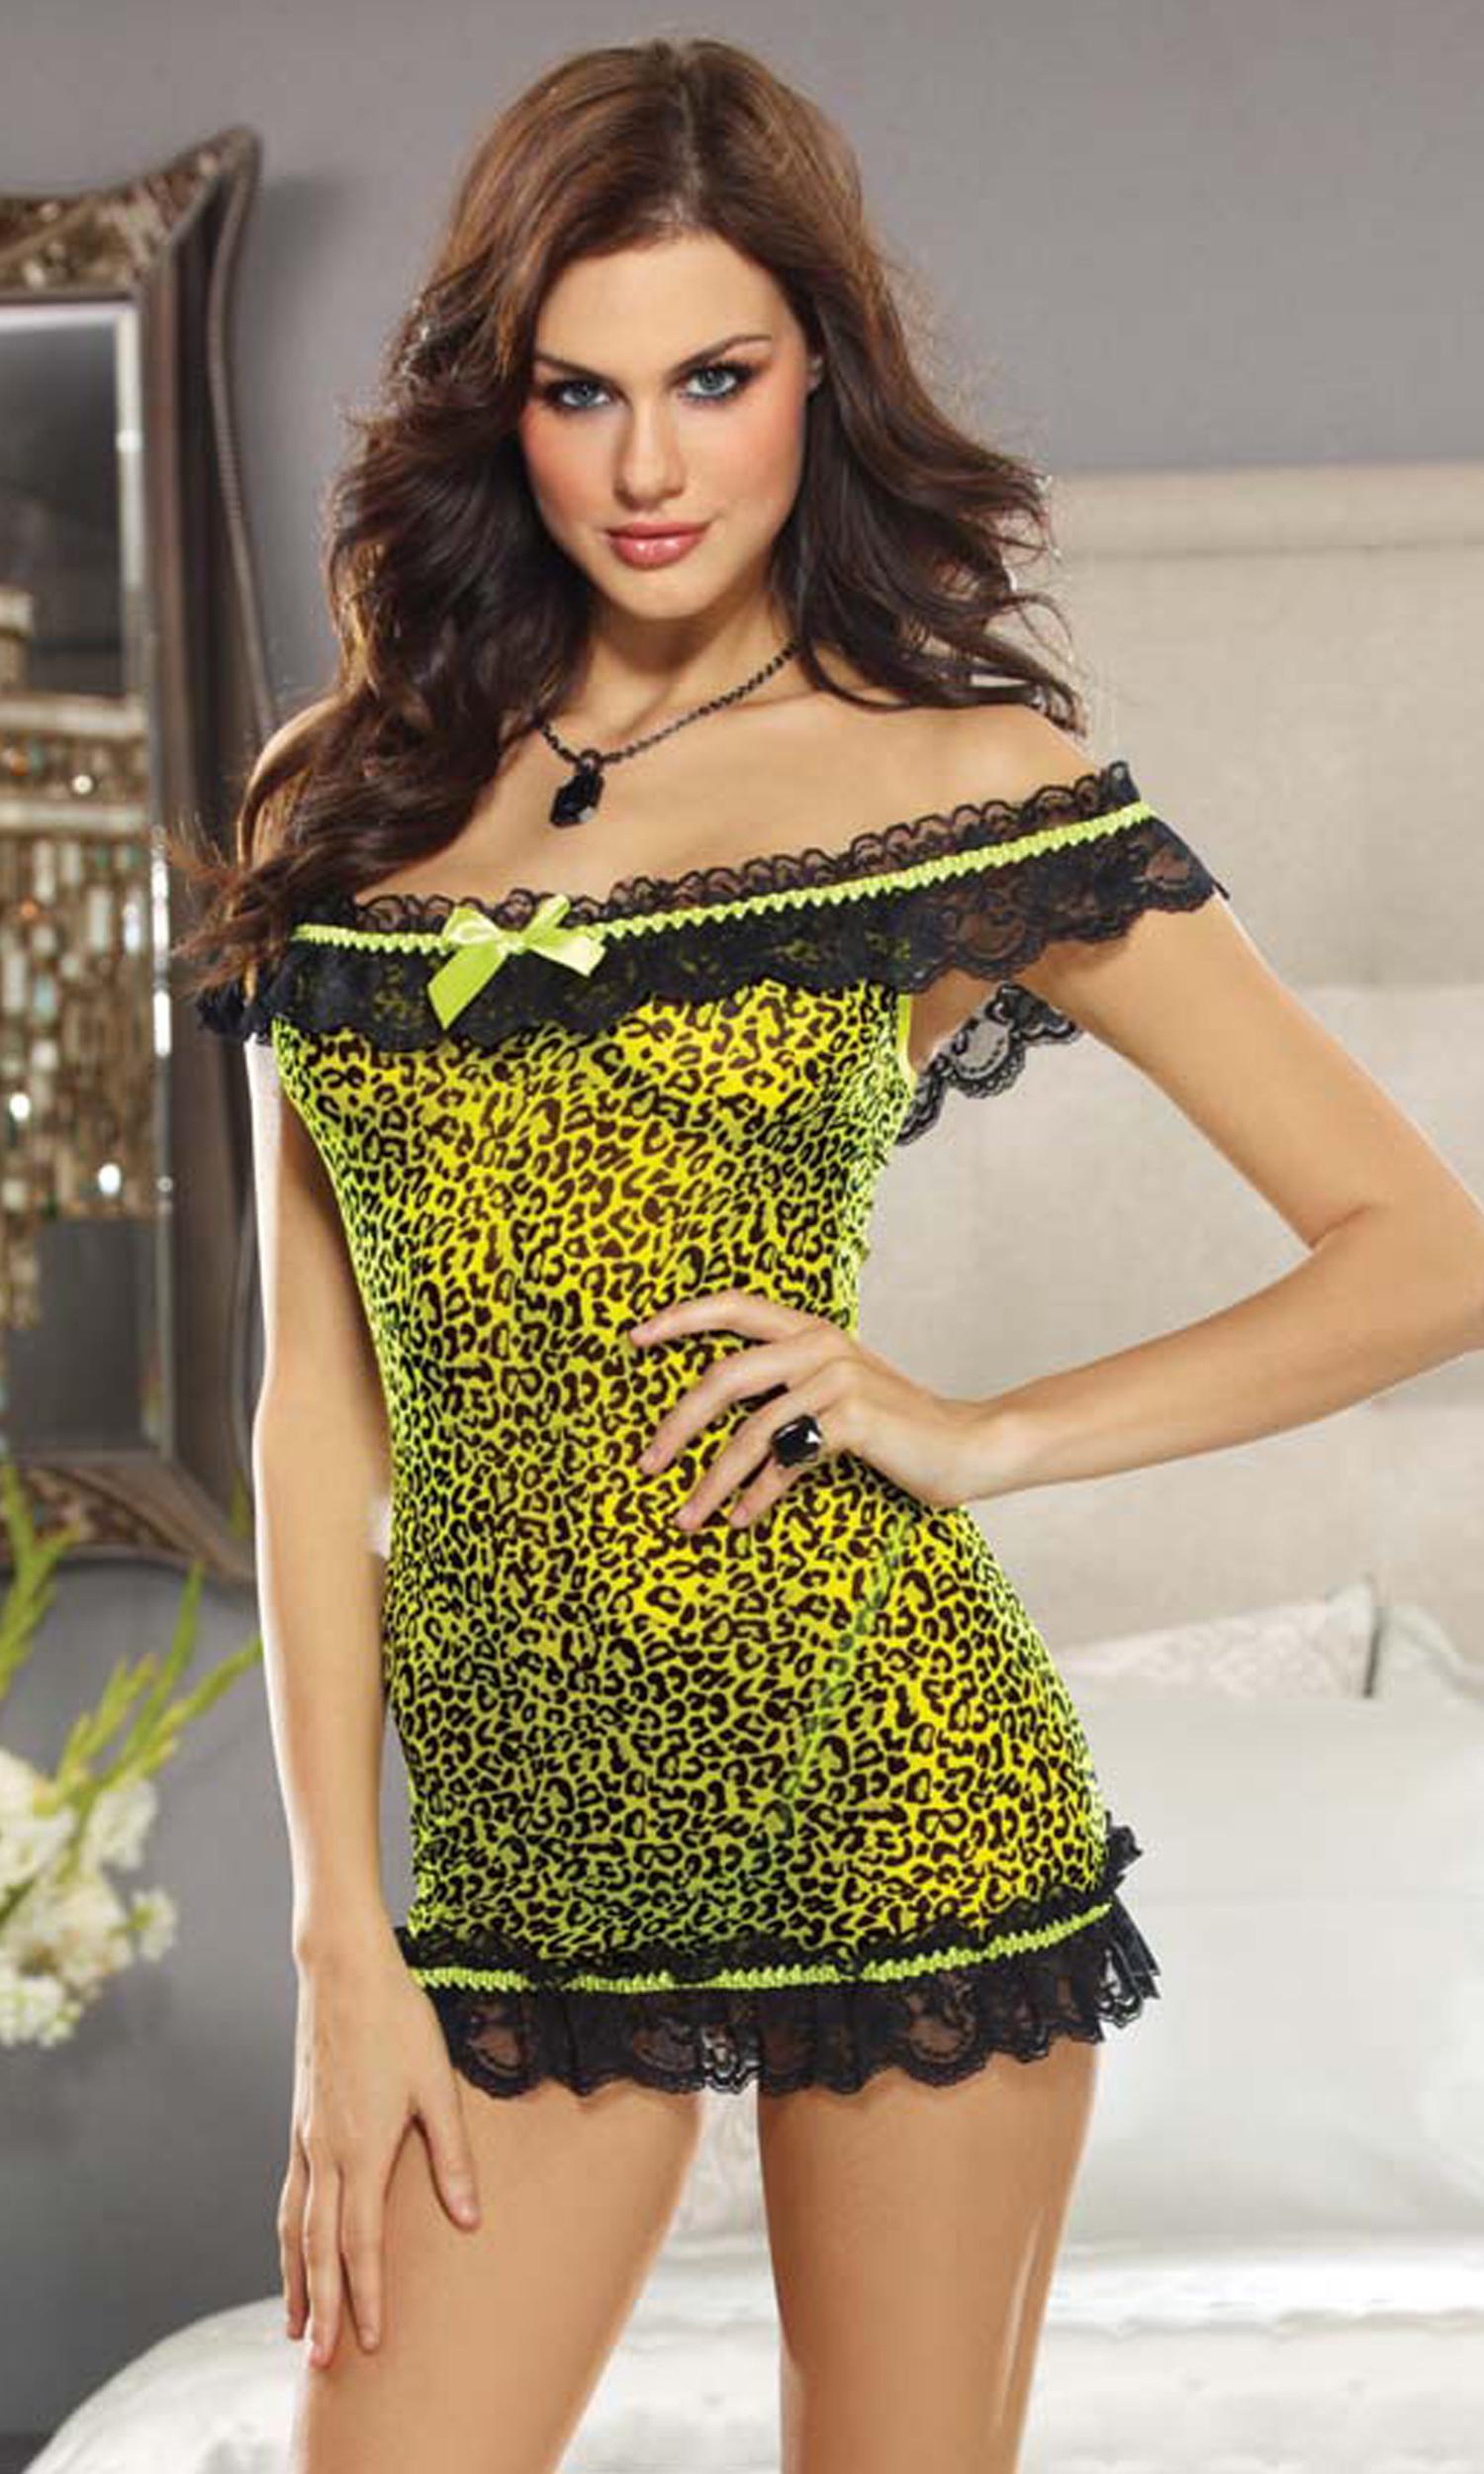 شورت زنانه تحریک کننده Leopard Print Stretch Mesh Chemise